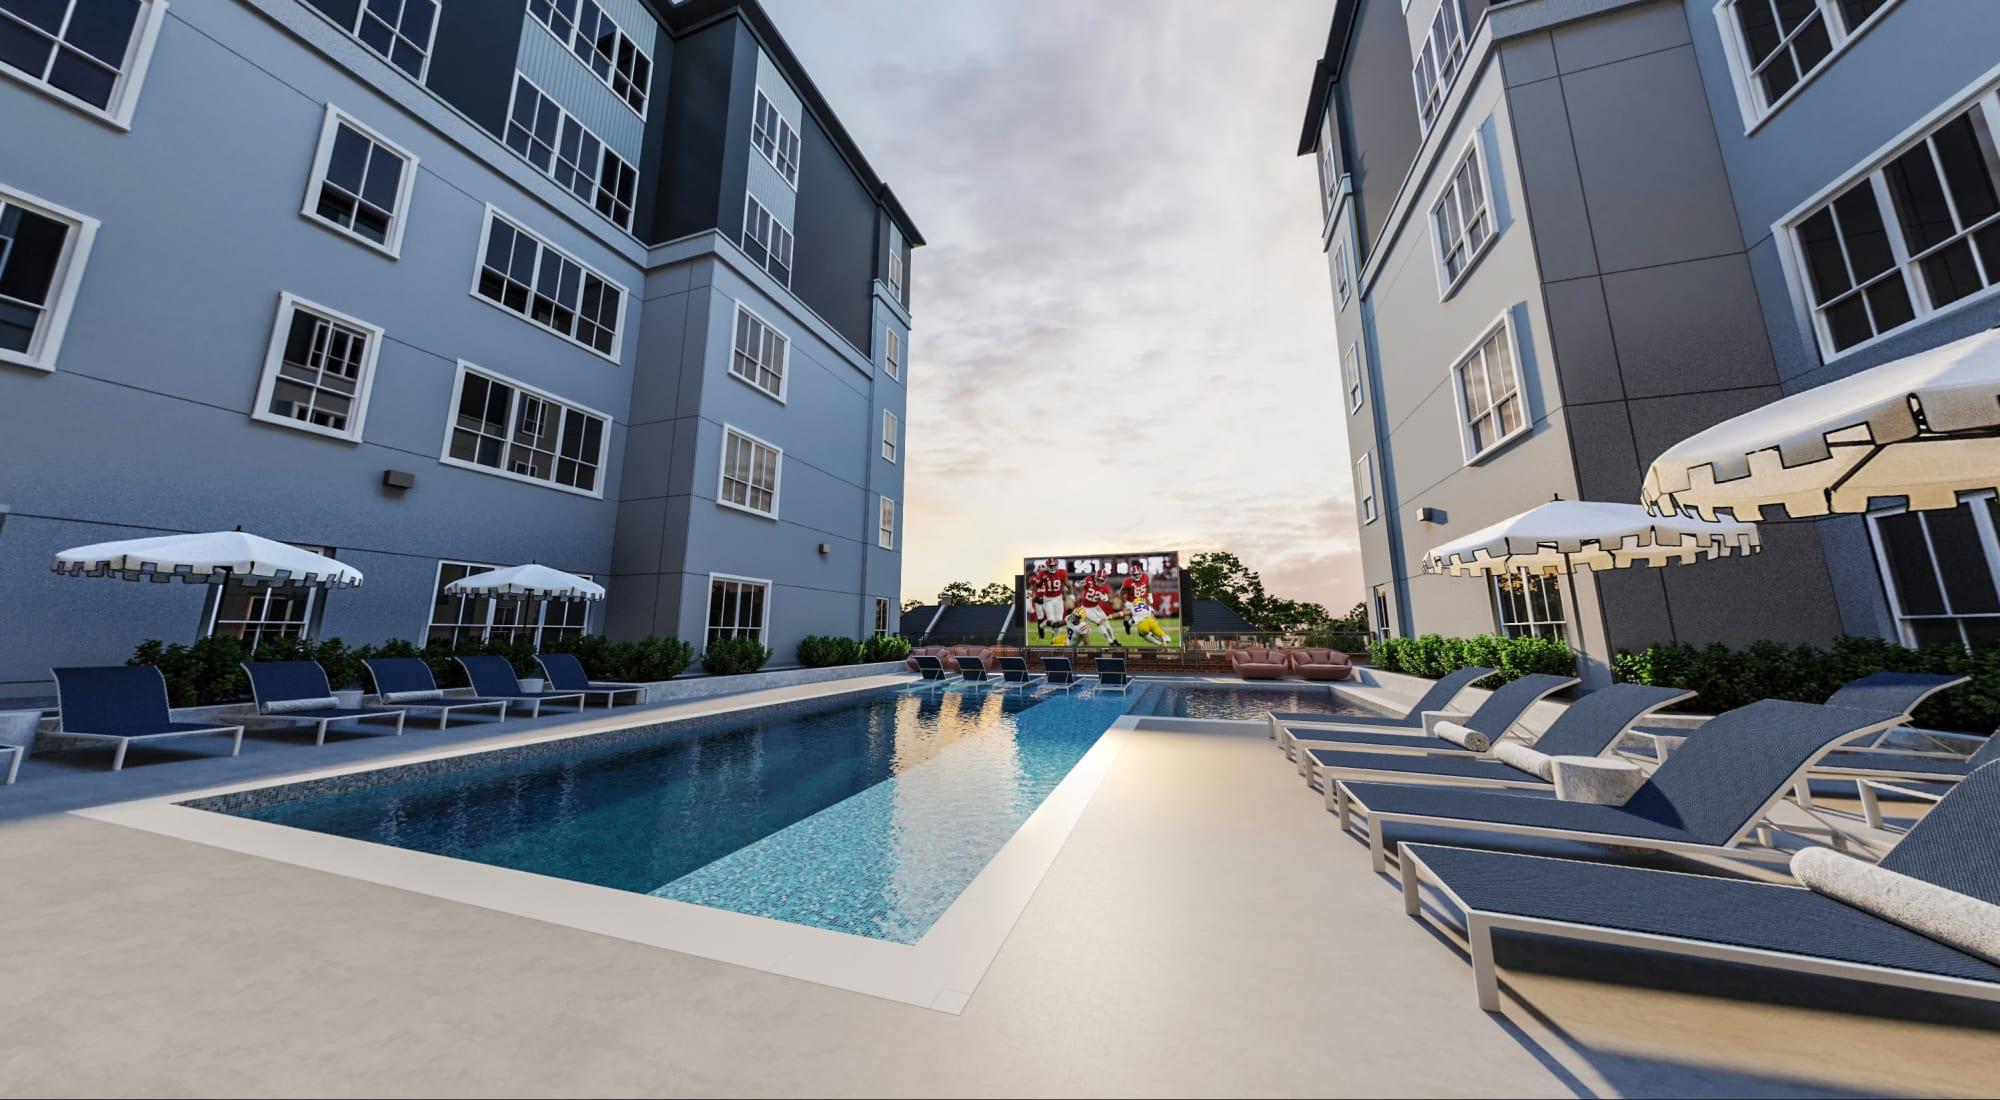 Off-Campus Student Apartments at HERE Tuscaloosa in Tuscaloosa, Alabama